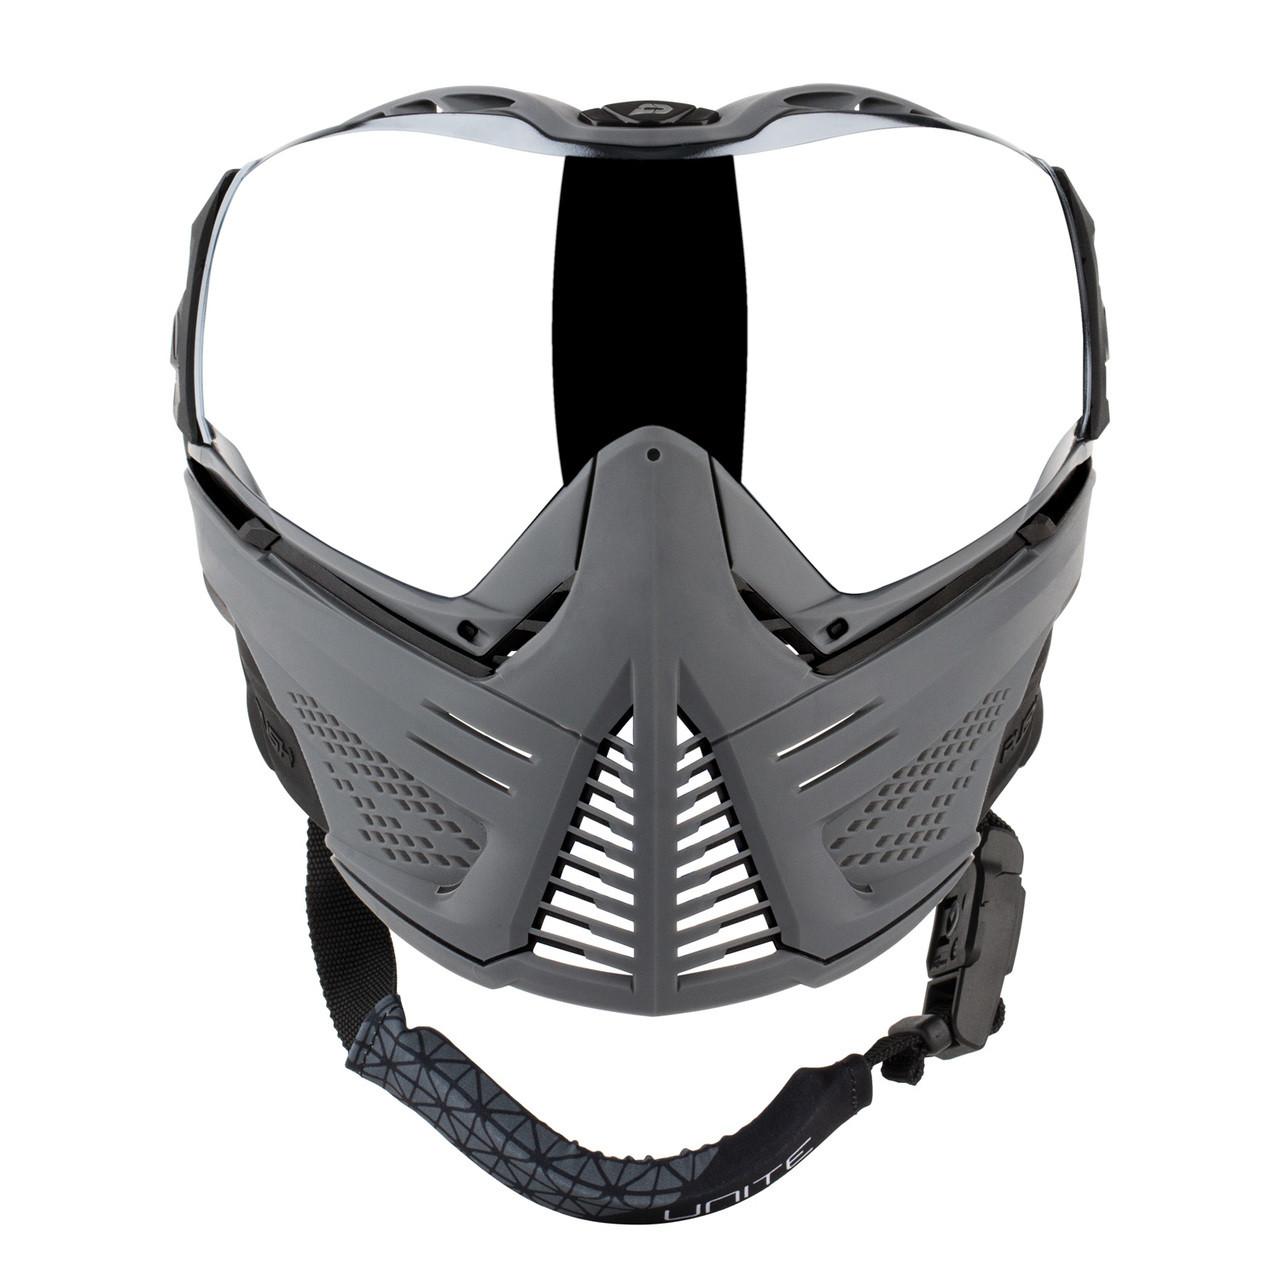 Push - Unite Goggle - Grey/Black